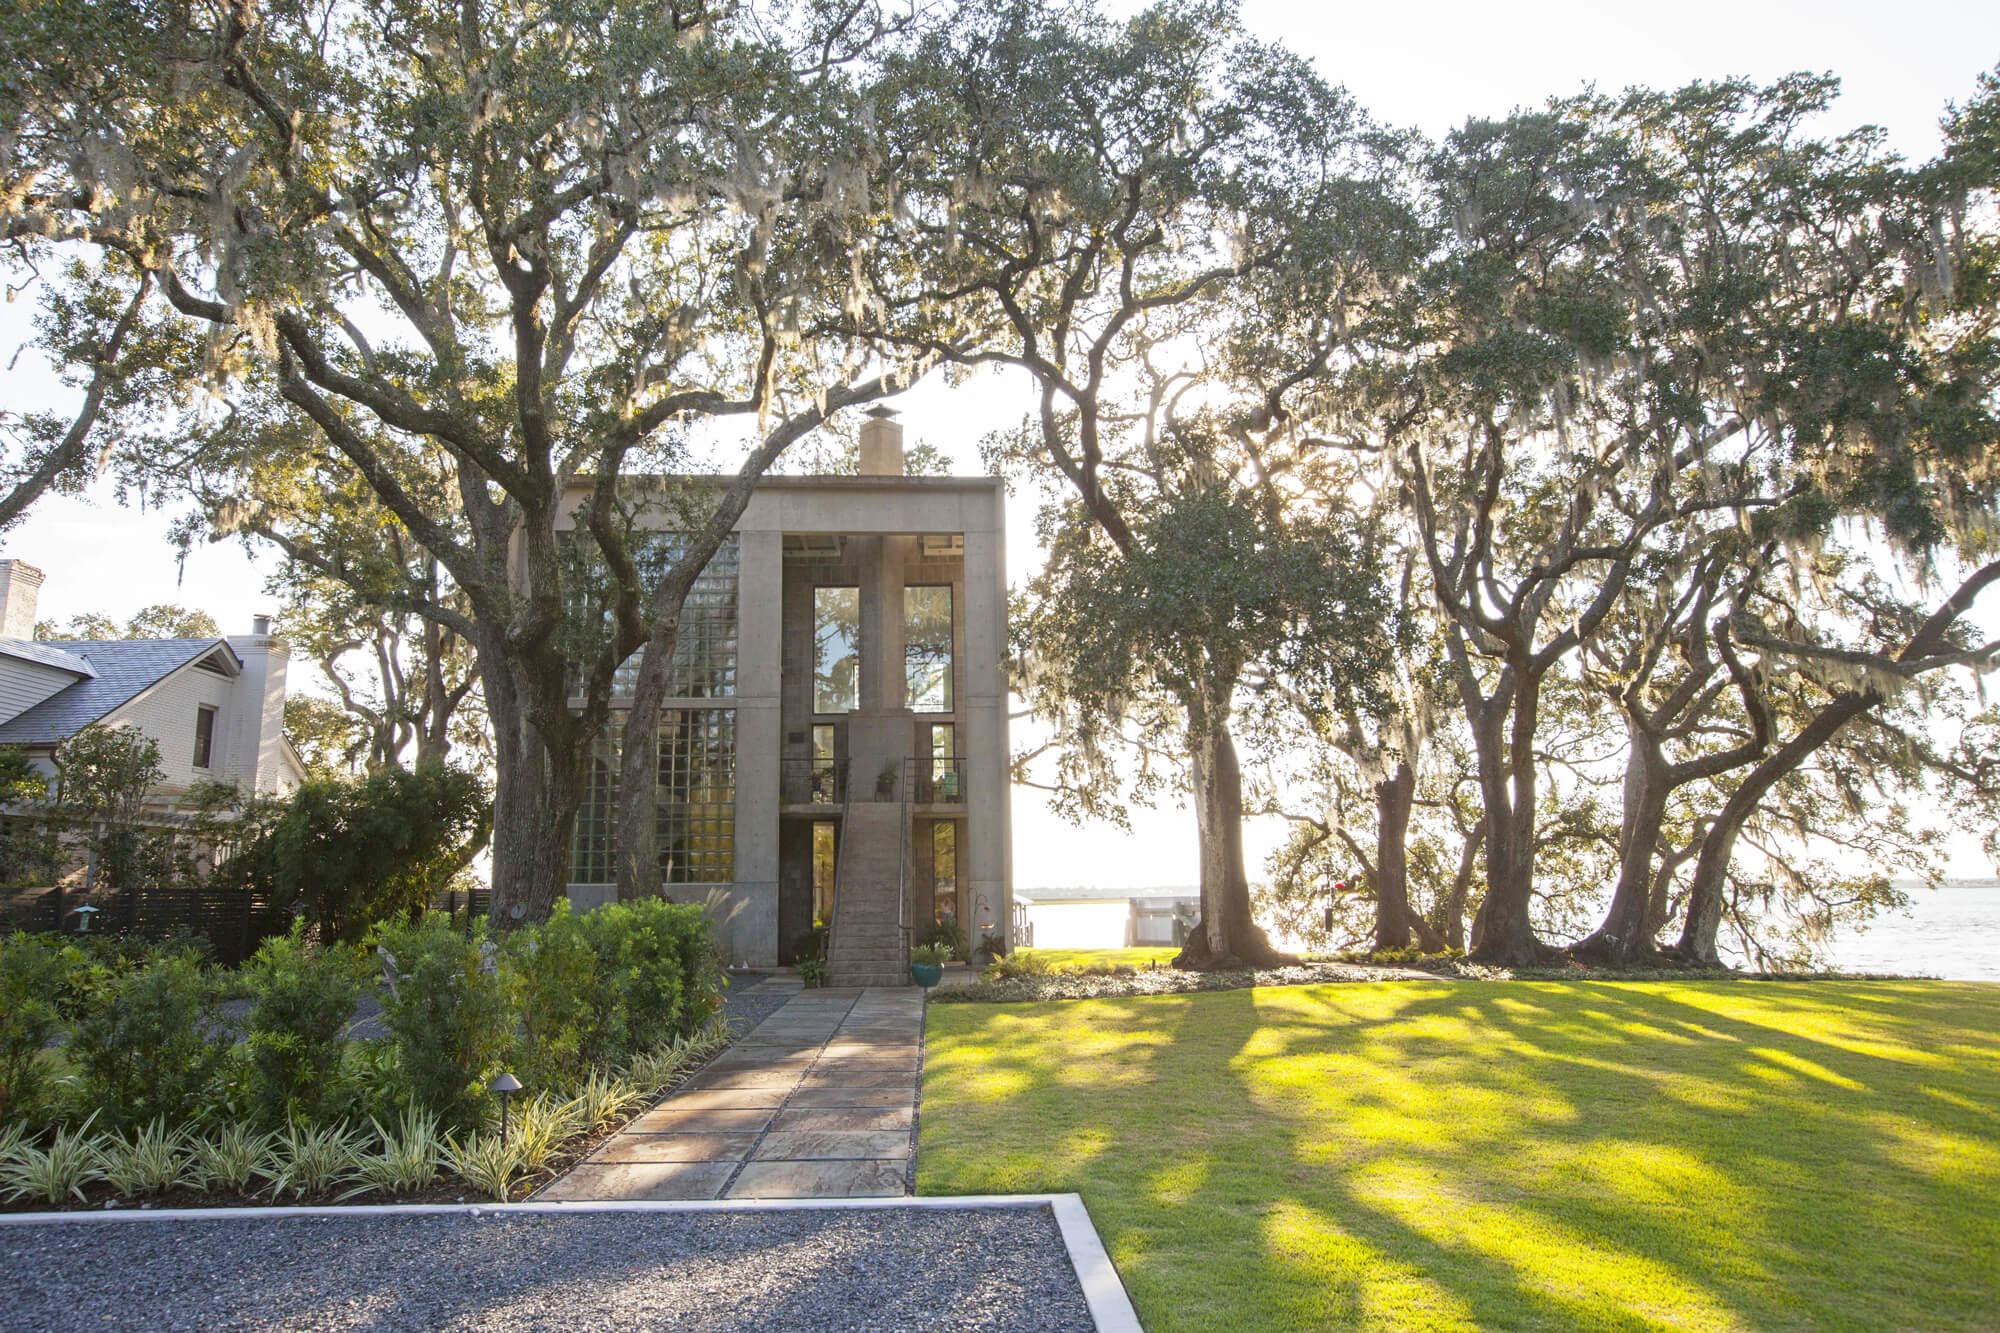 Outdoor-Spatial-Design-Charleston-South-Carolina